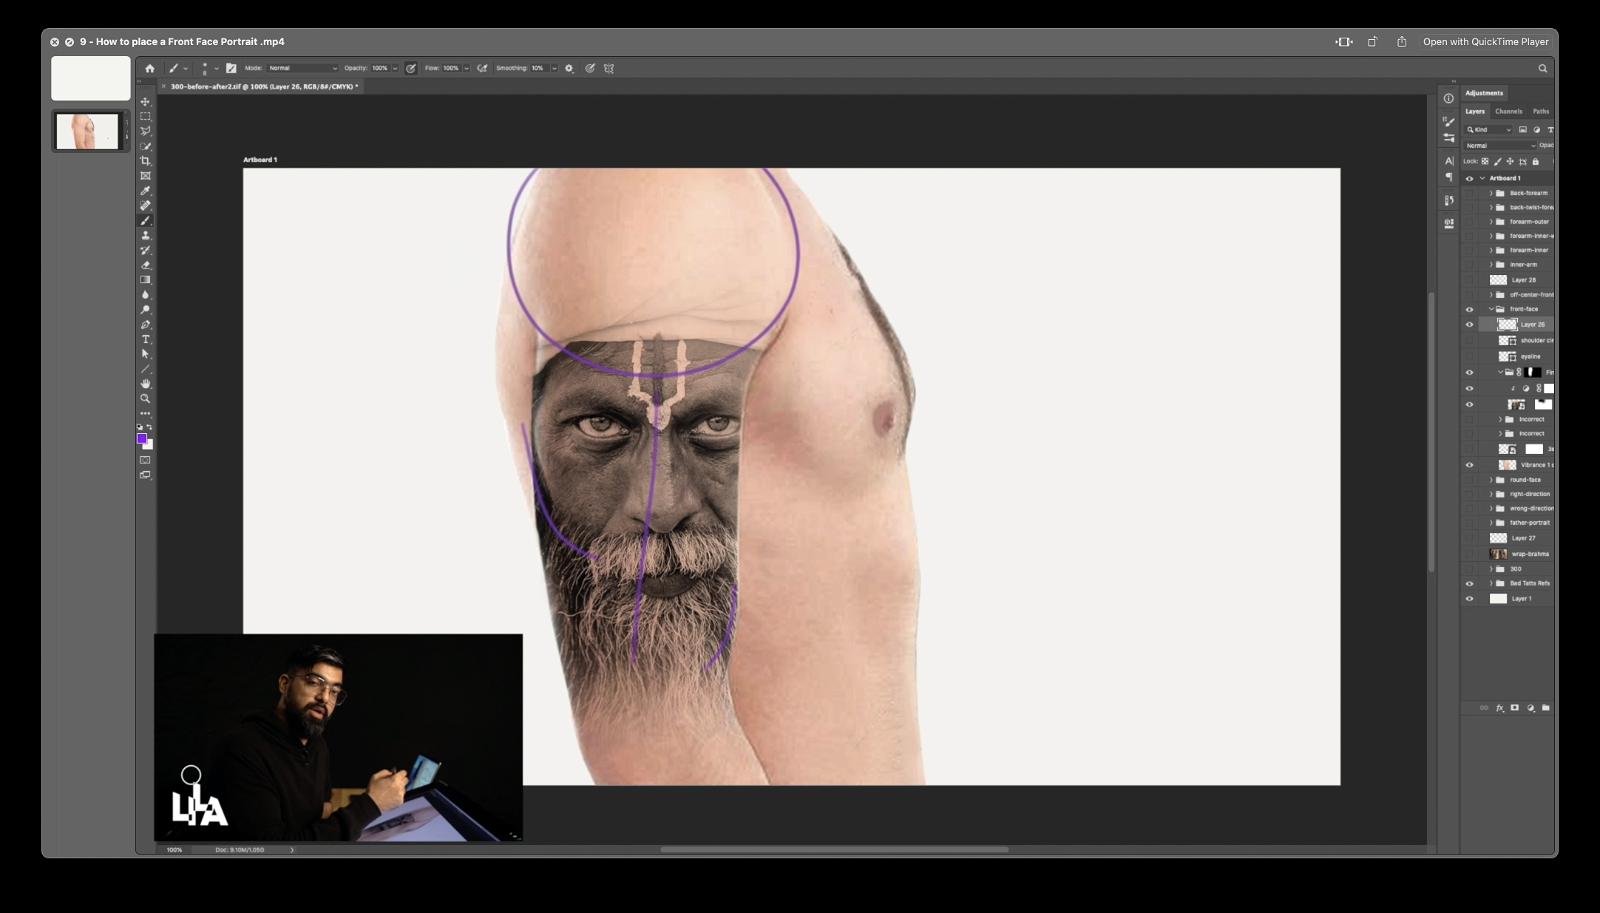 How to place a Front Face Portrait